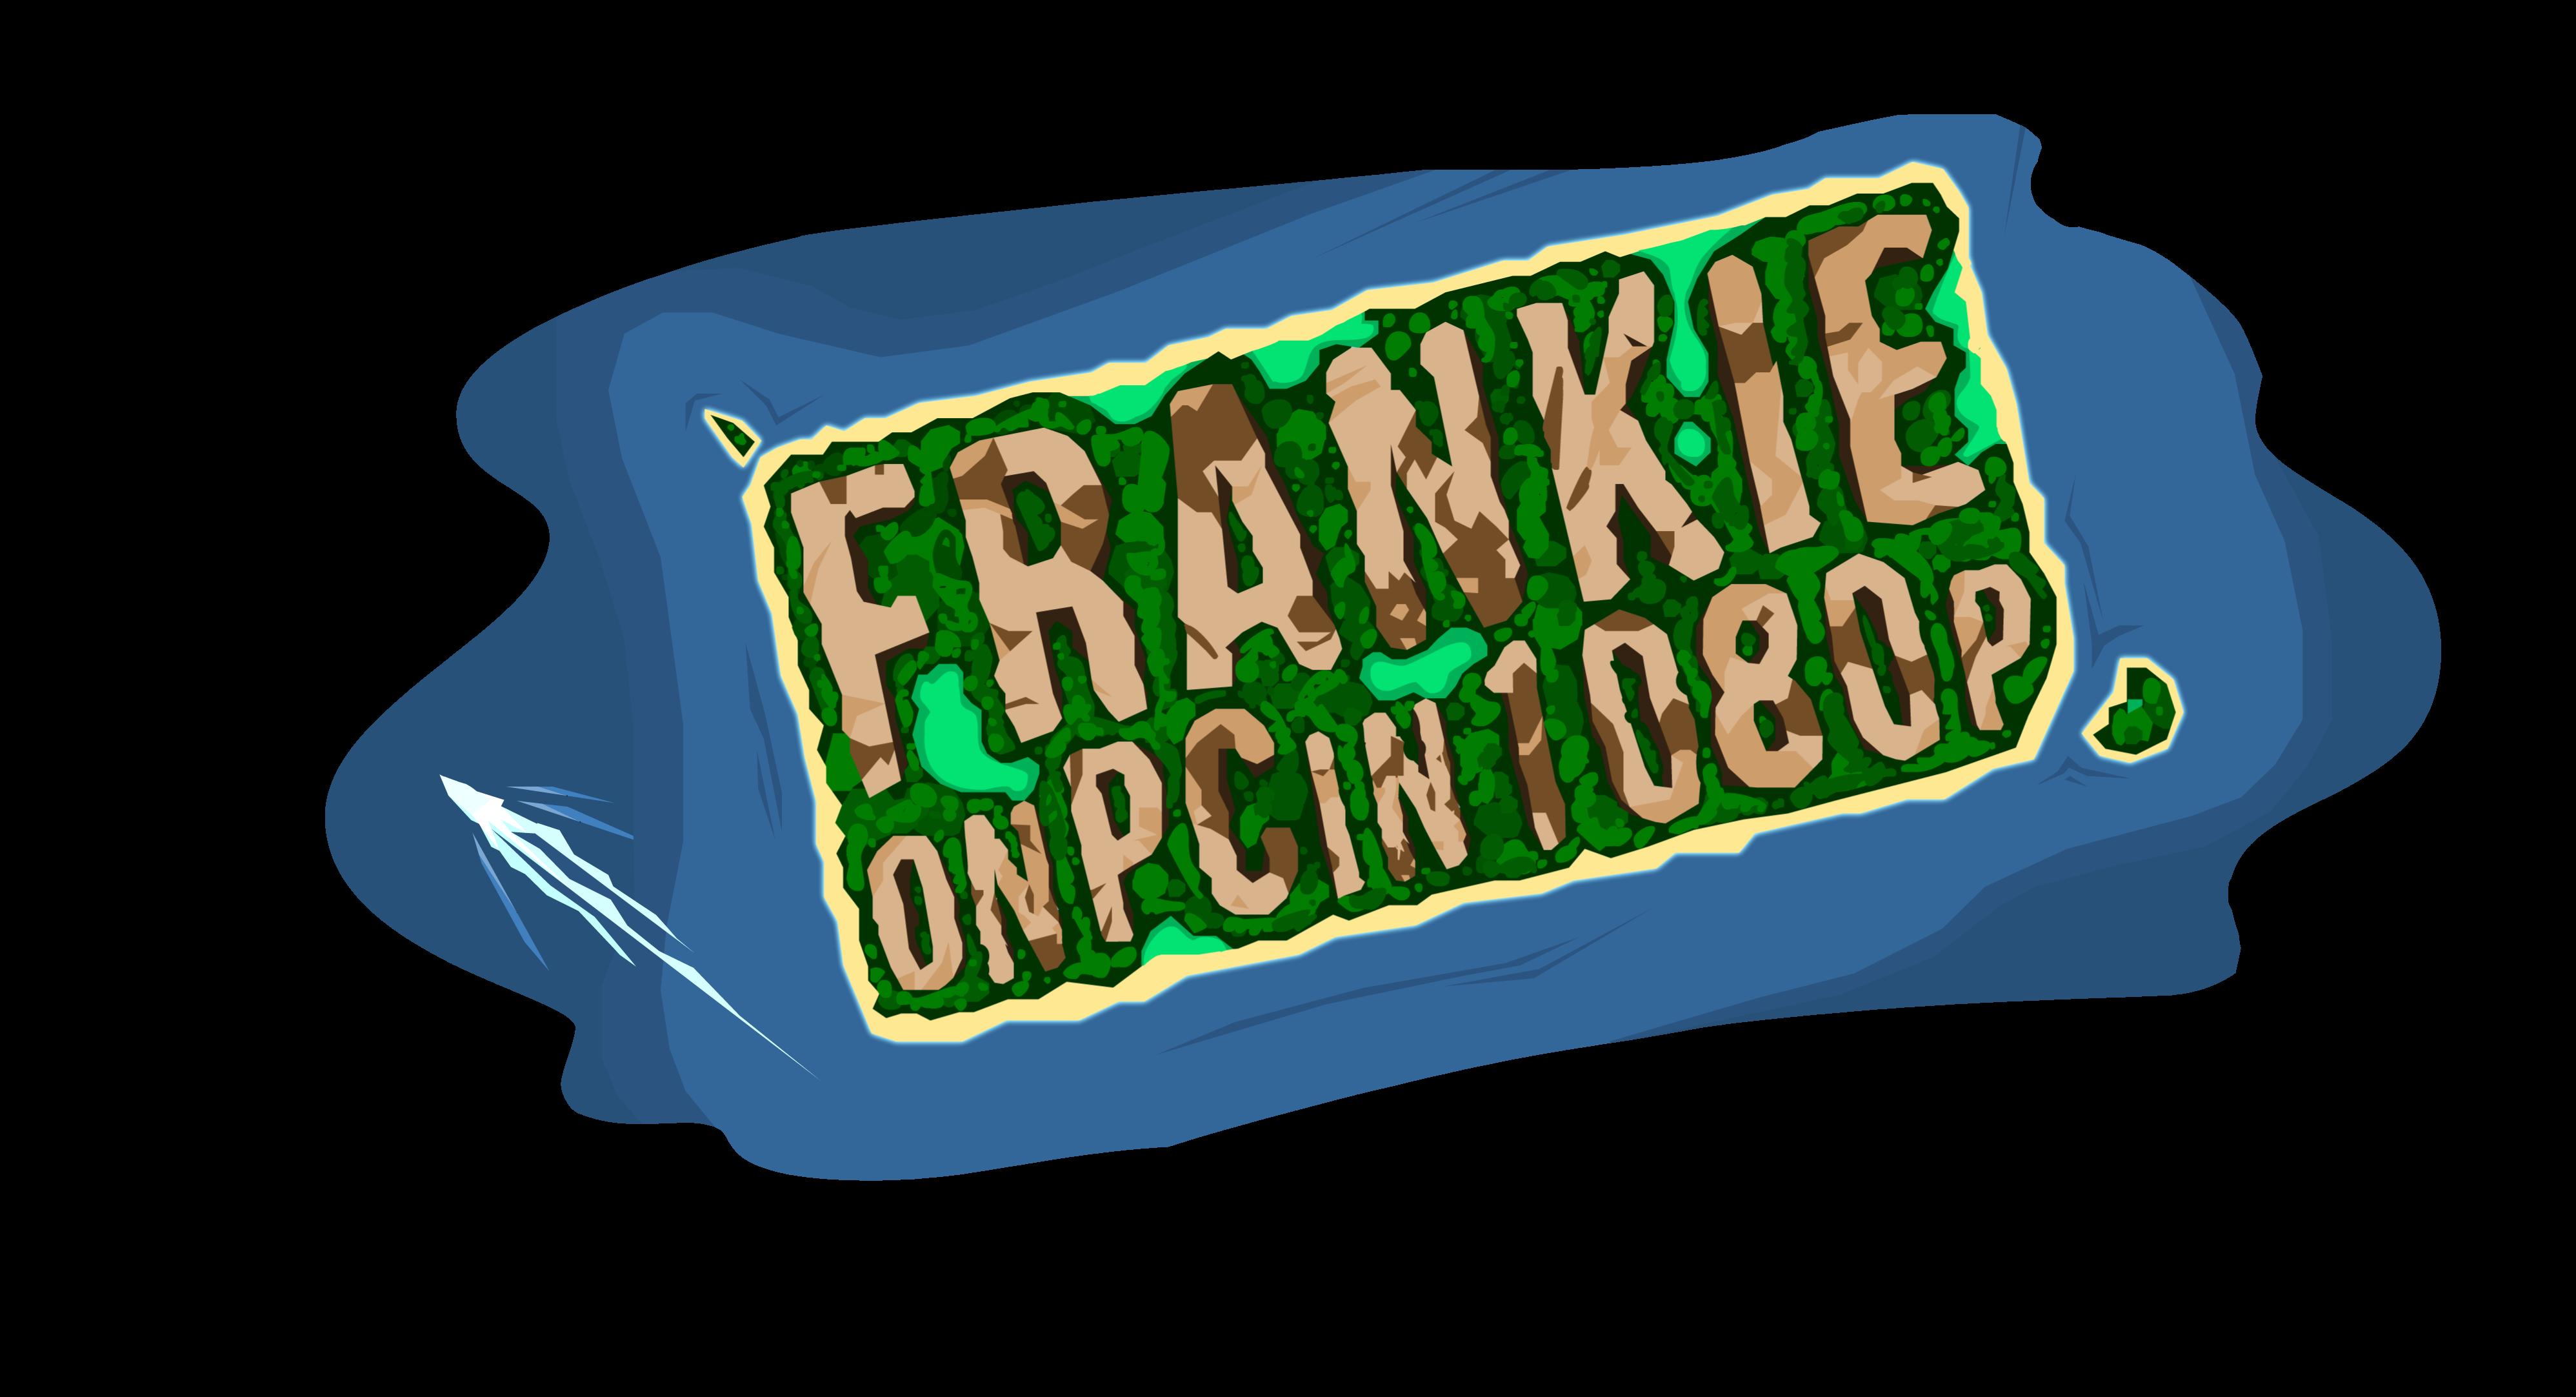 FrankieonPCin1080p Logo Redone